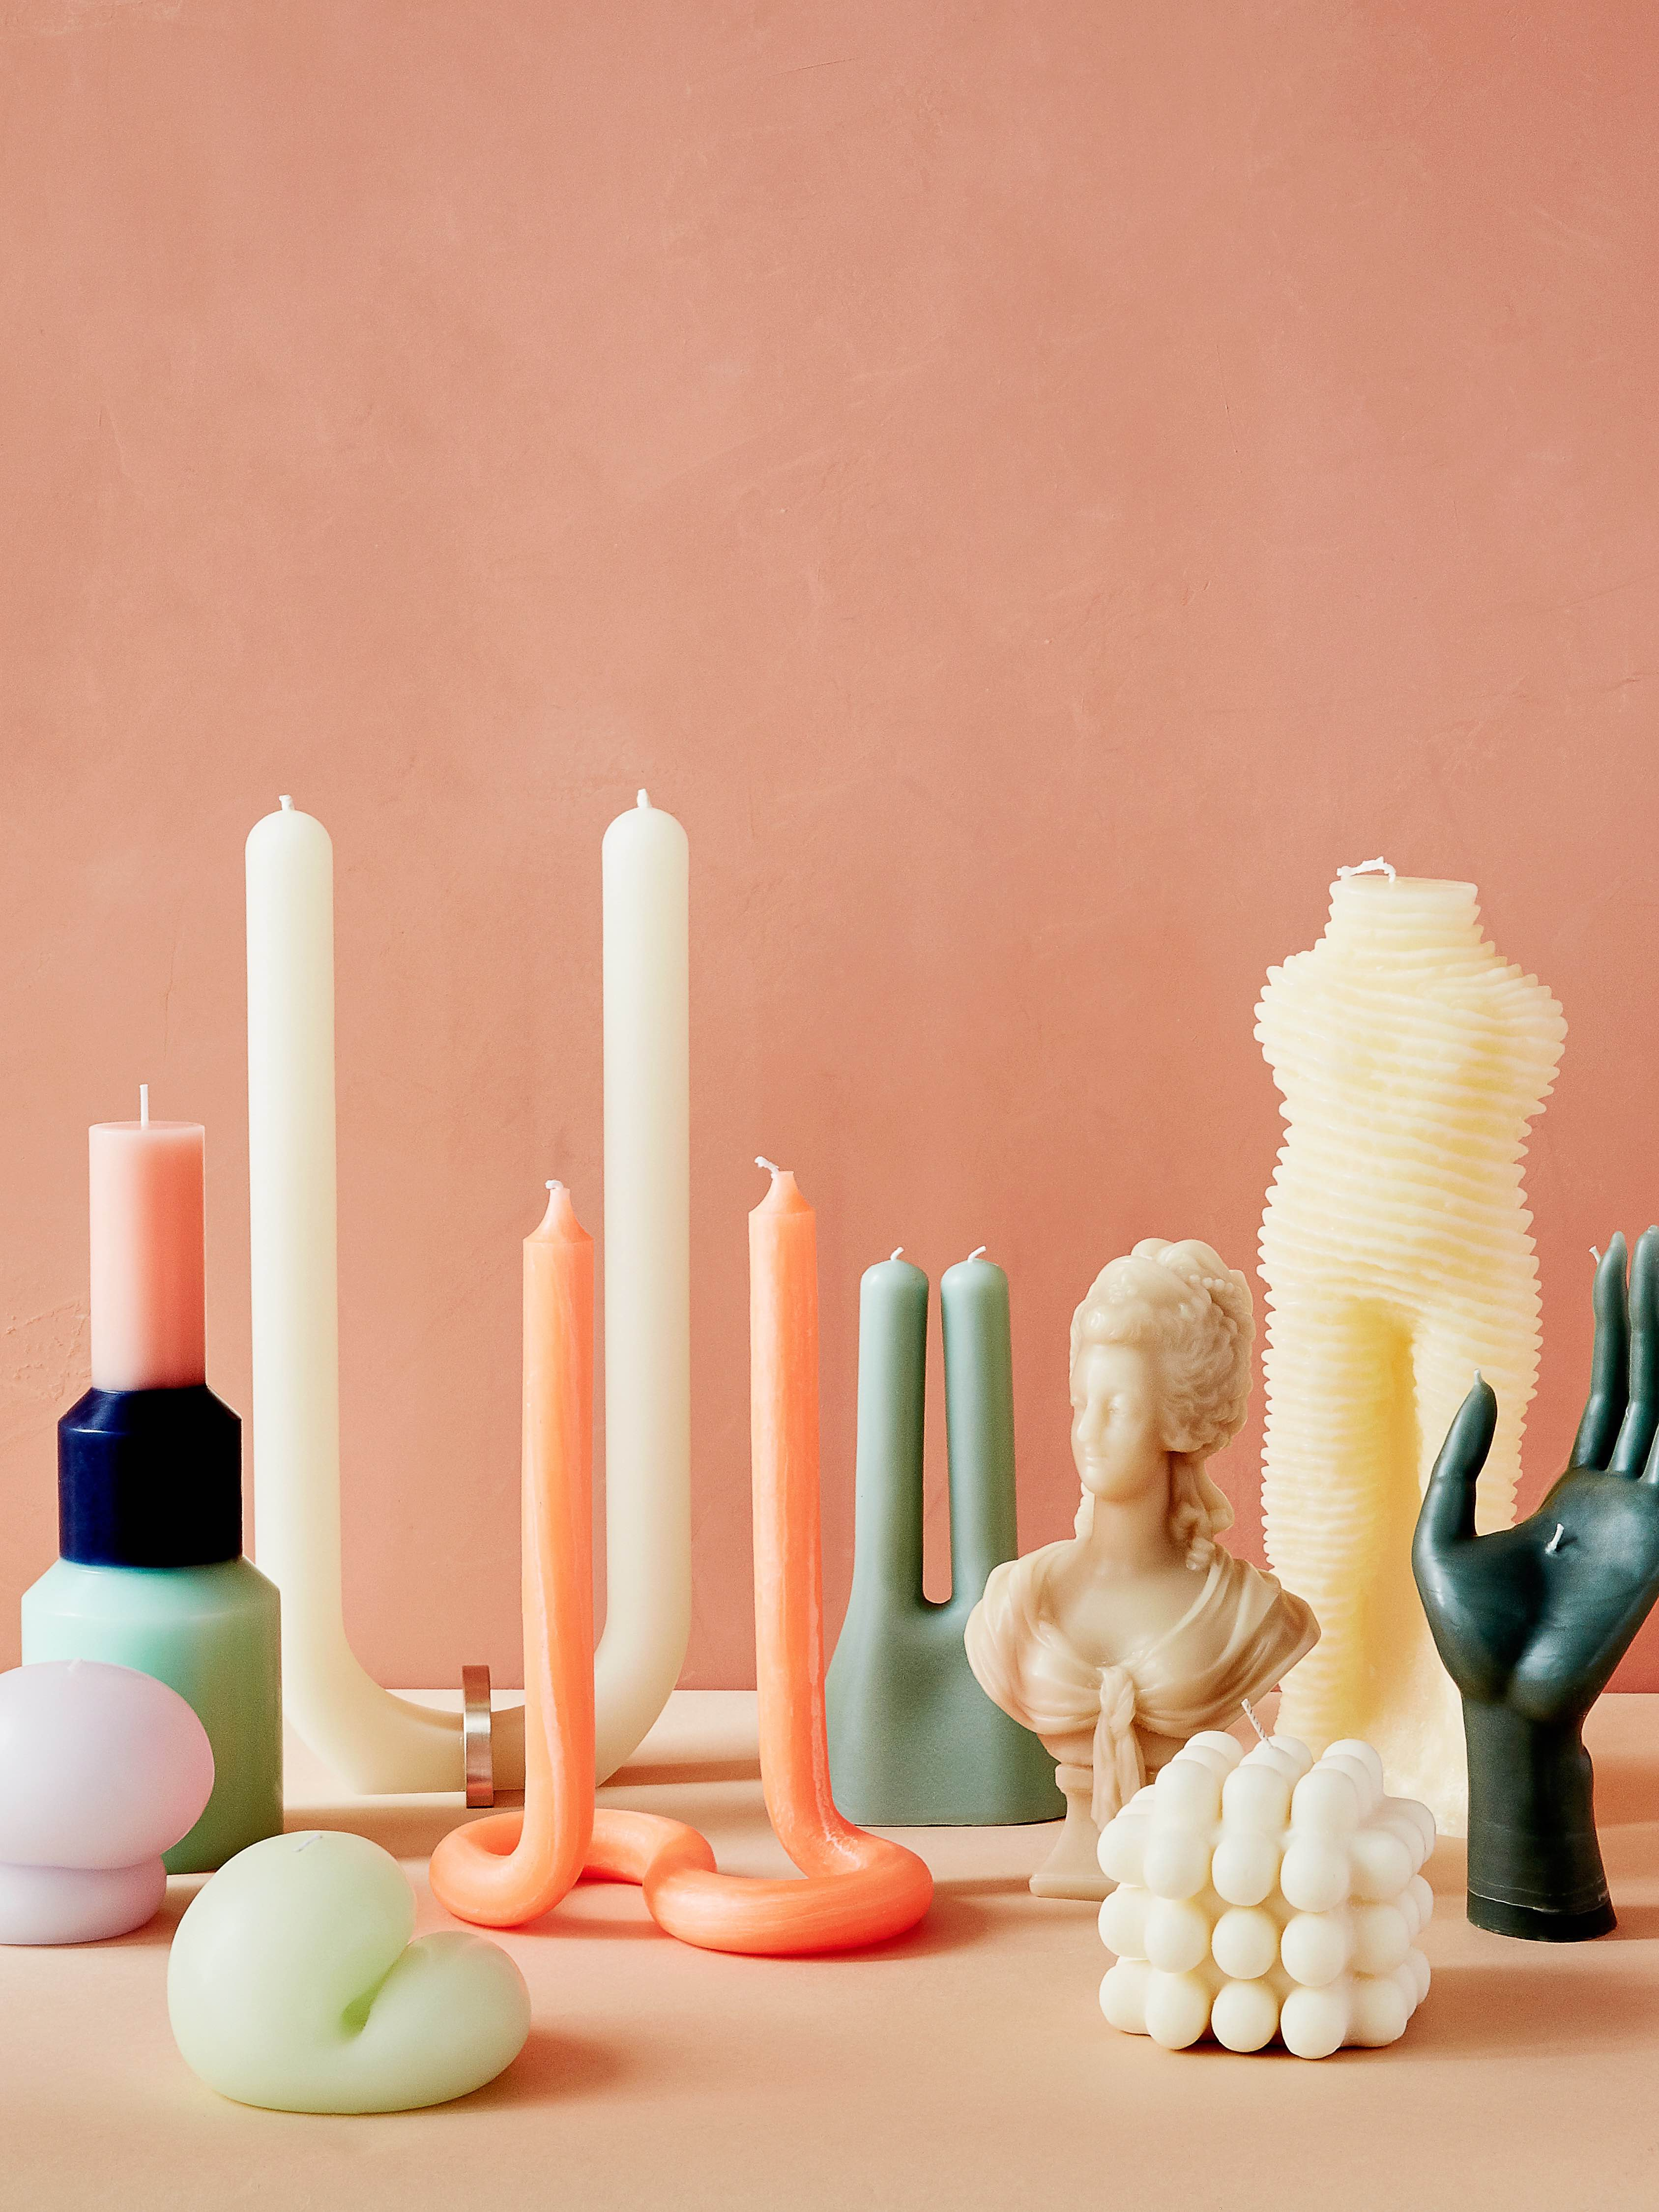 00-FEATURE-unique-candles-burn-domino